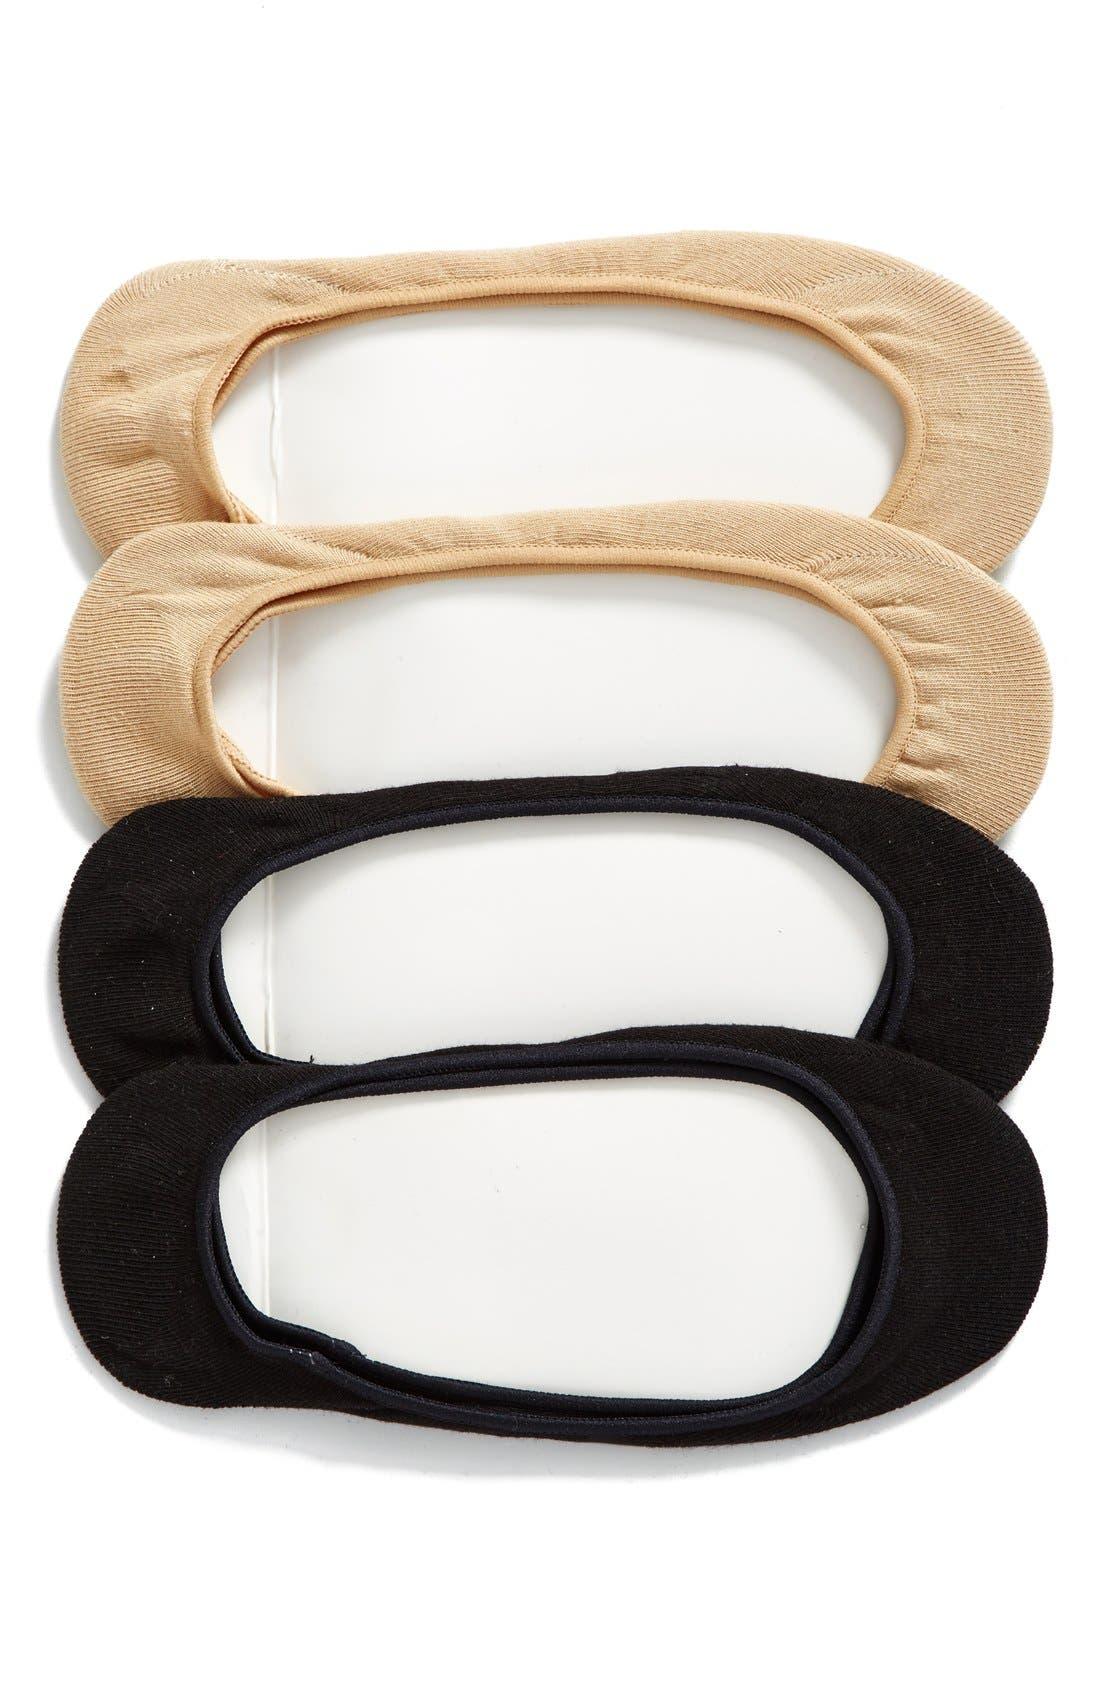 4-Pack Liner Socks,                             Main thumbnail 1, color,                             Assorted Pack